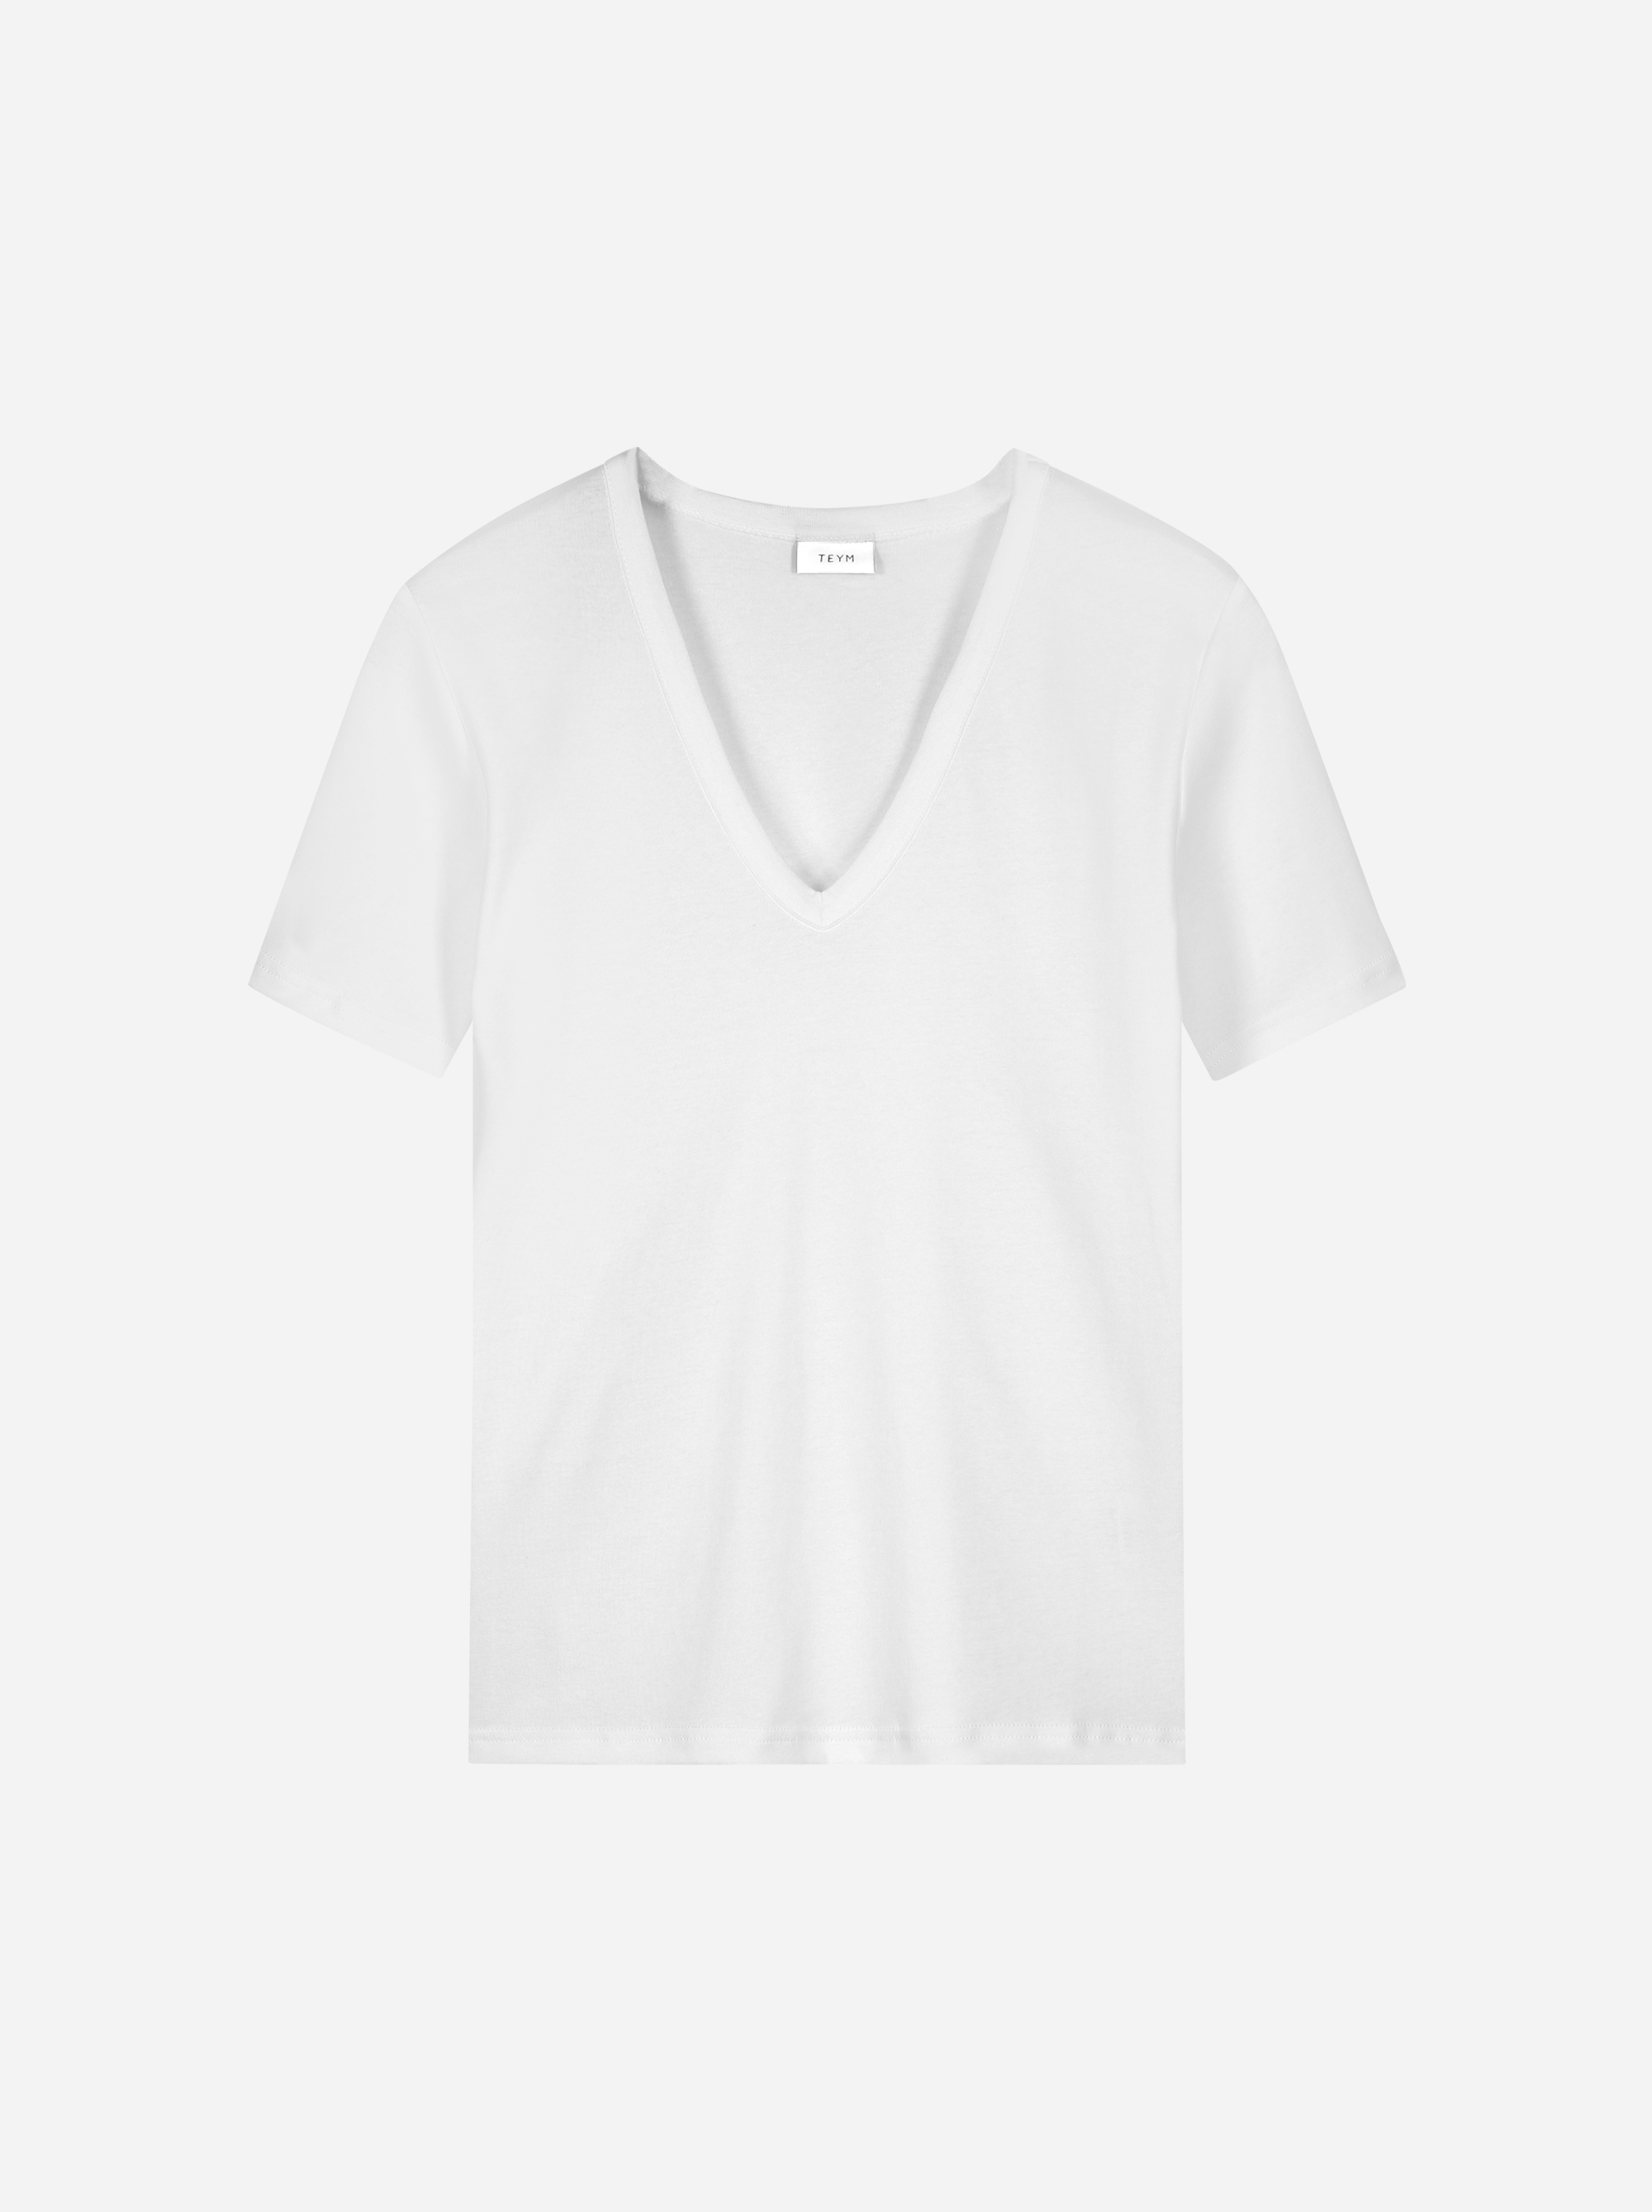 Teym_The V-Neck T-Shirt_white_female_front_1B